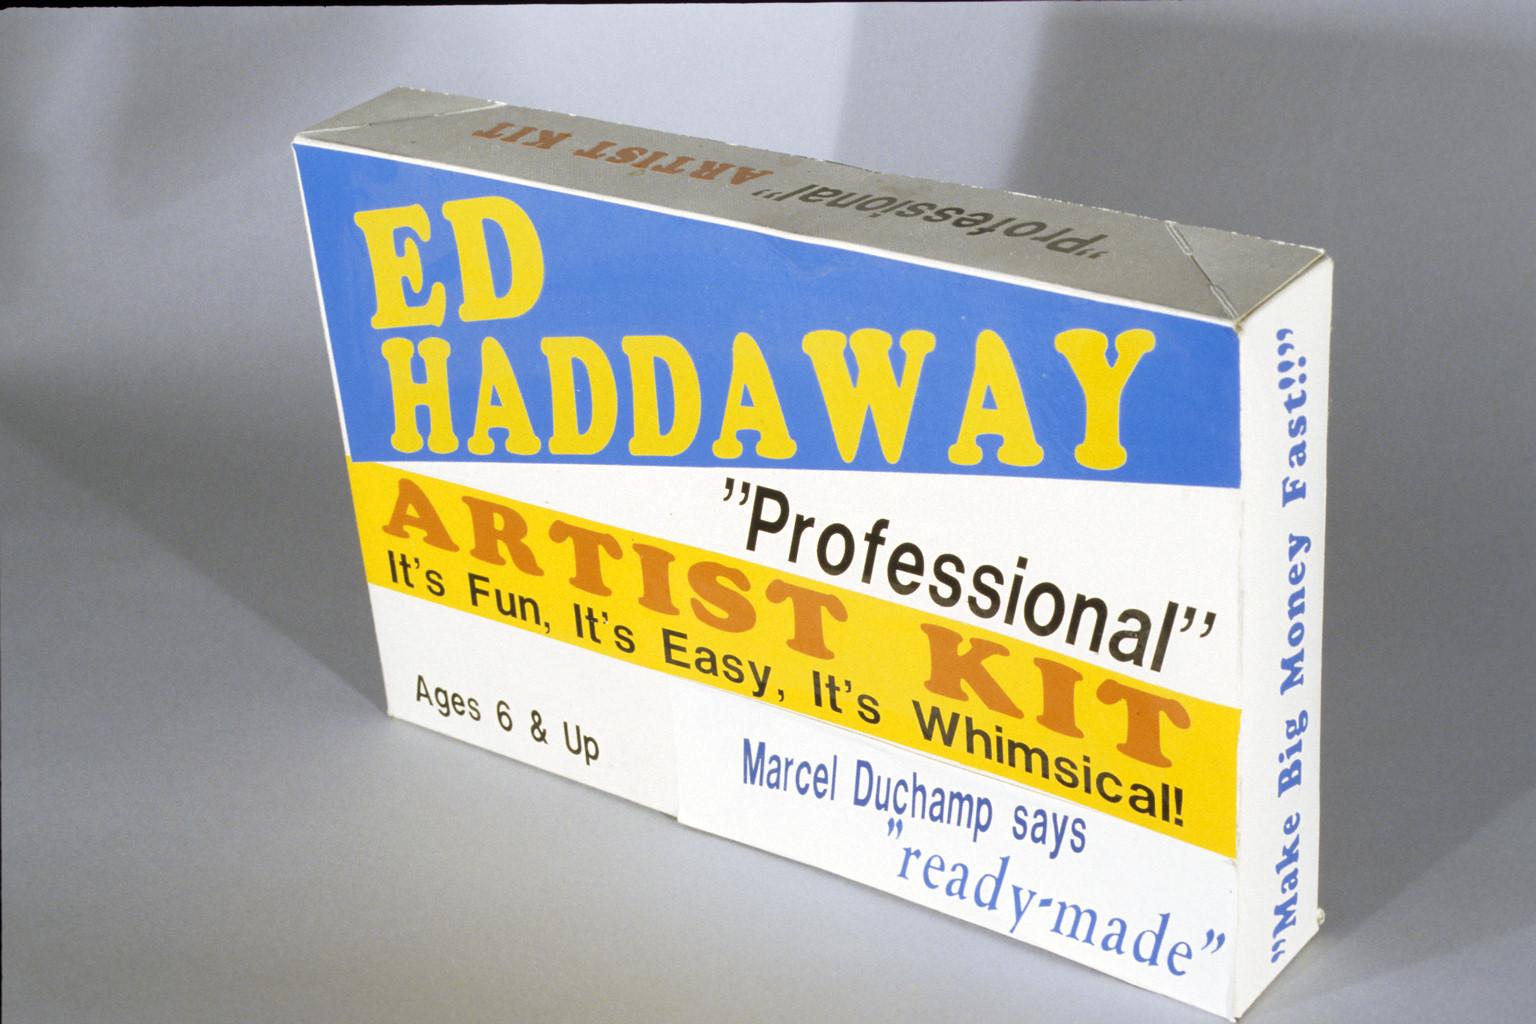 "ED HADDAWAY ""PROFESSIONAL"" ARTIST KIT"